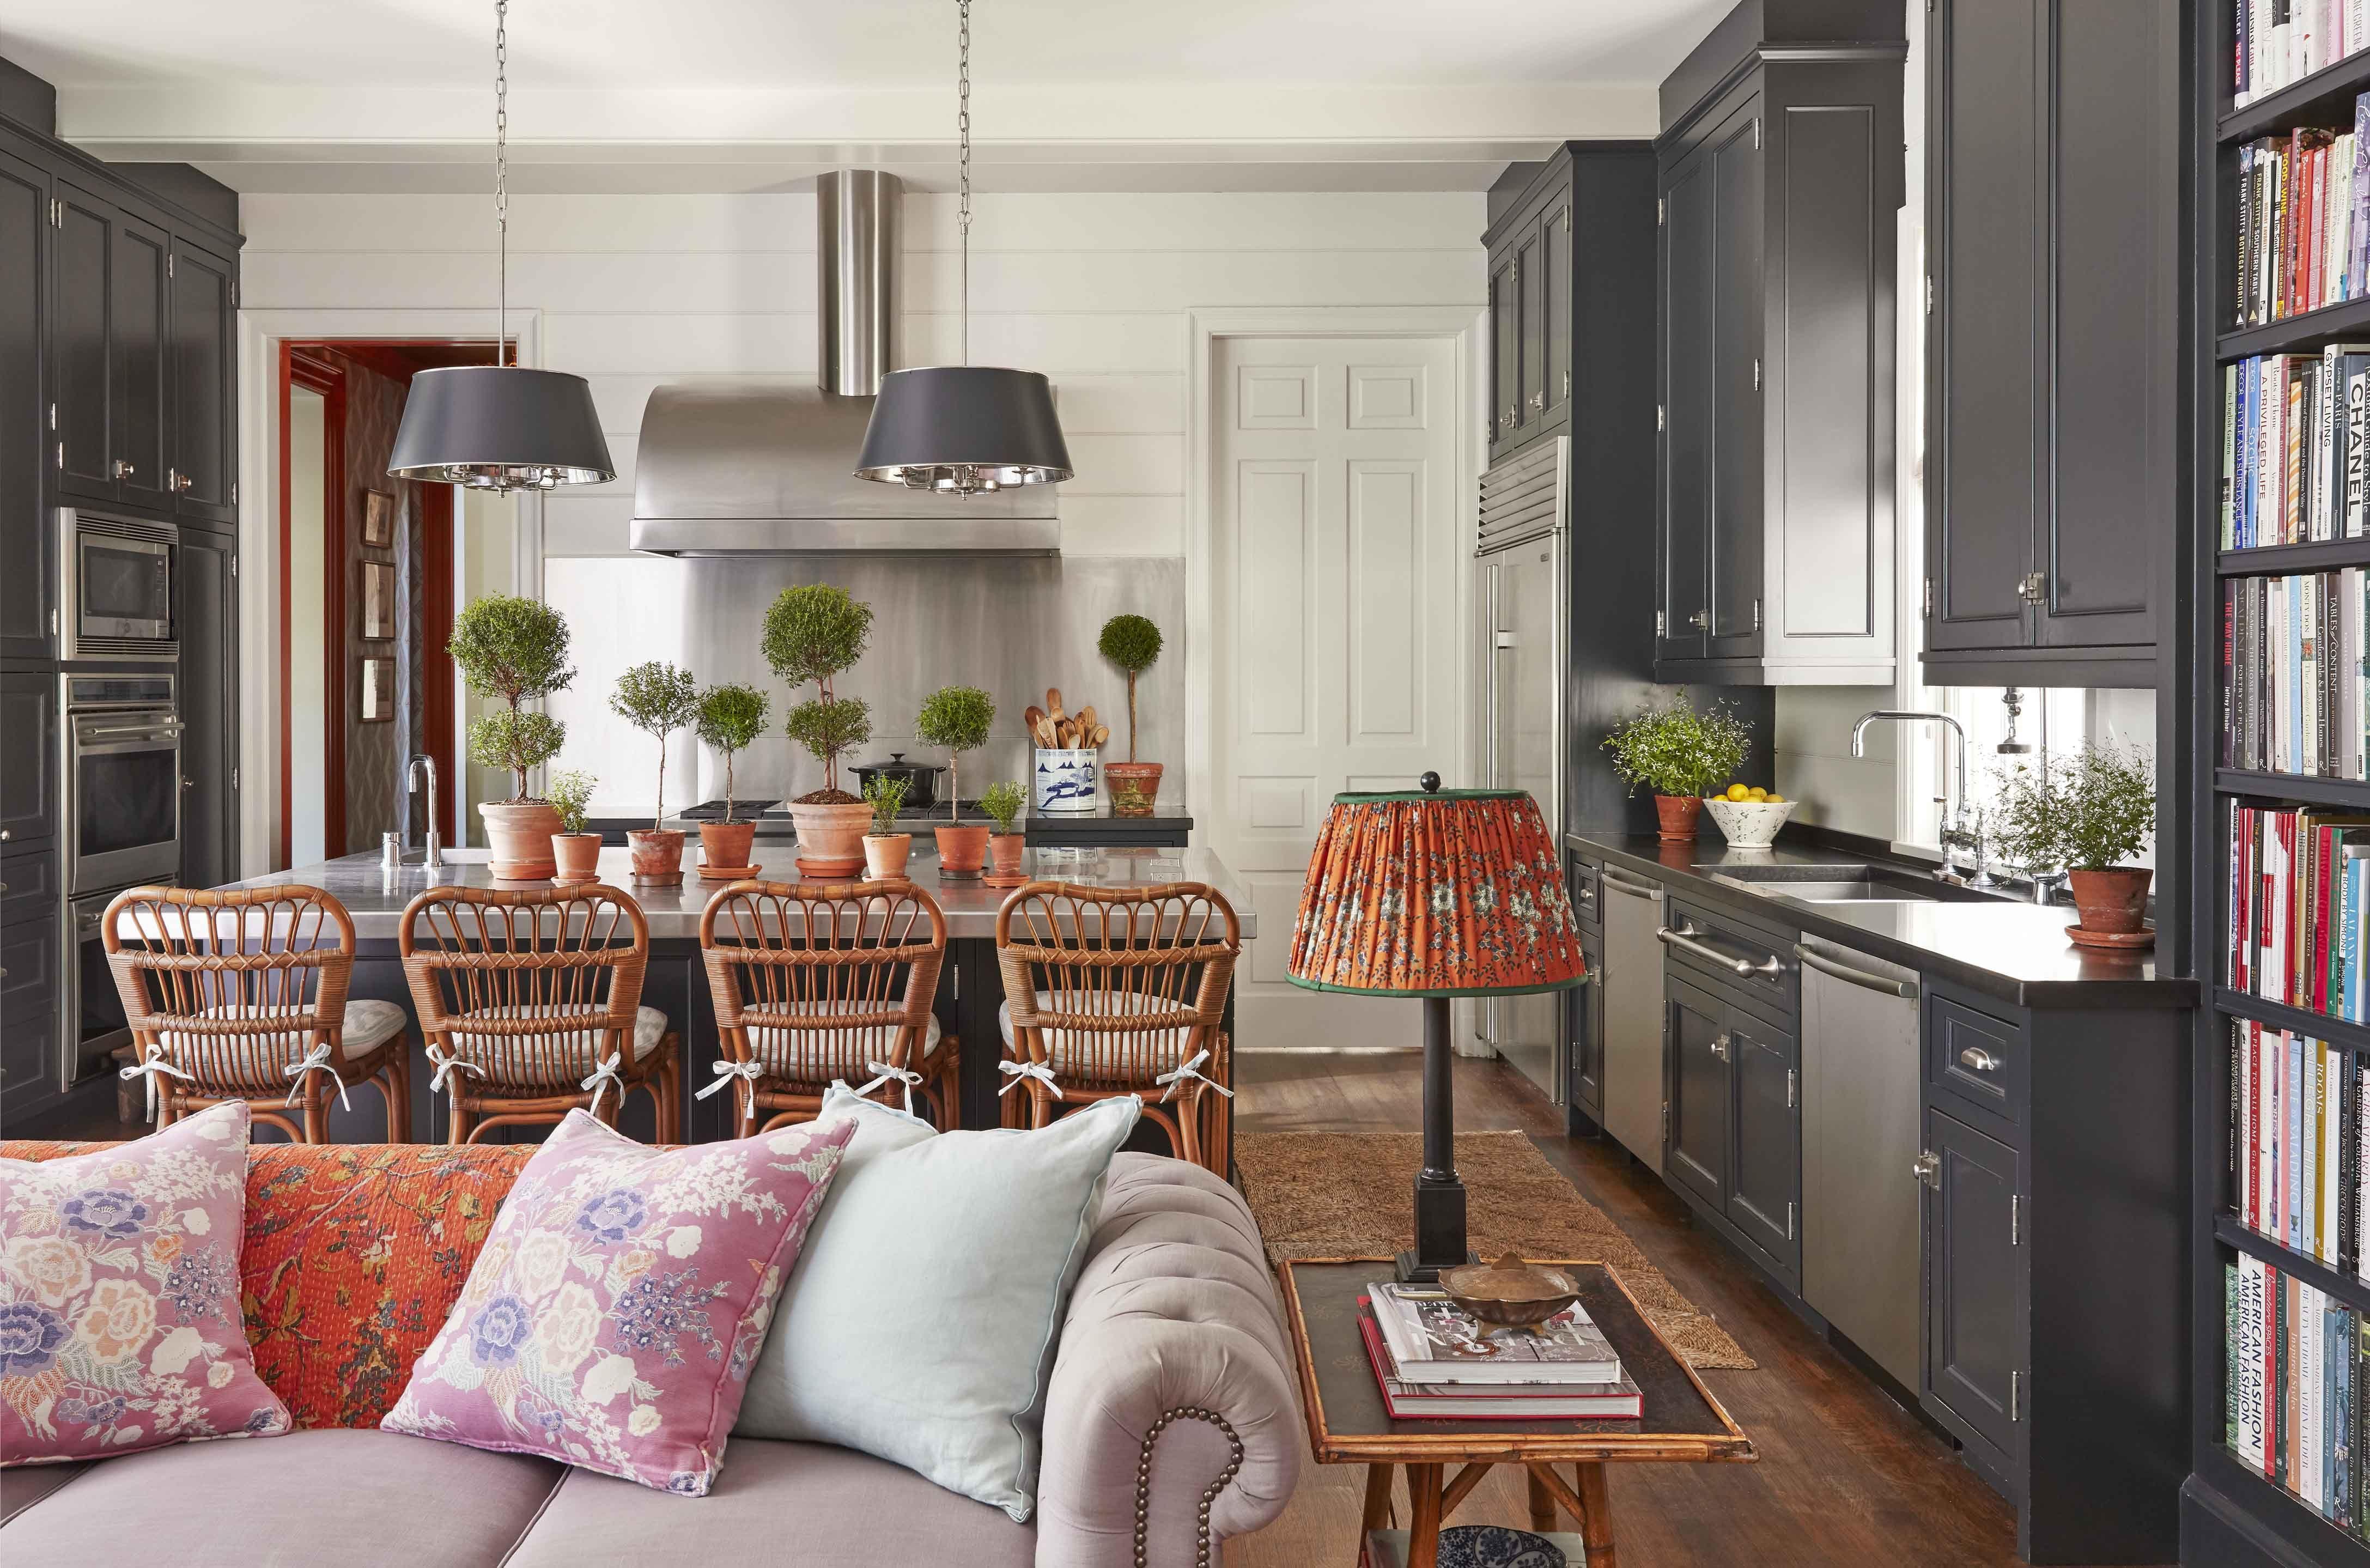 17 Best Kitchen Decor Ideas - Decorating for the Kitchen